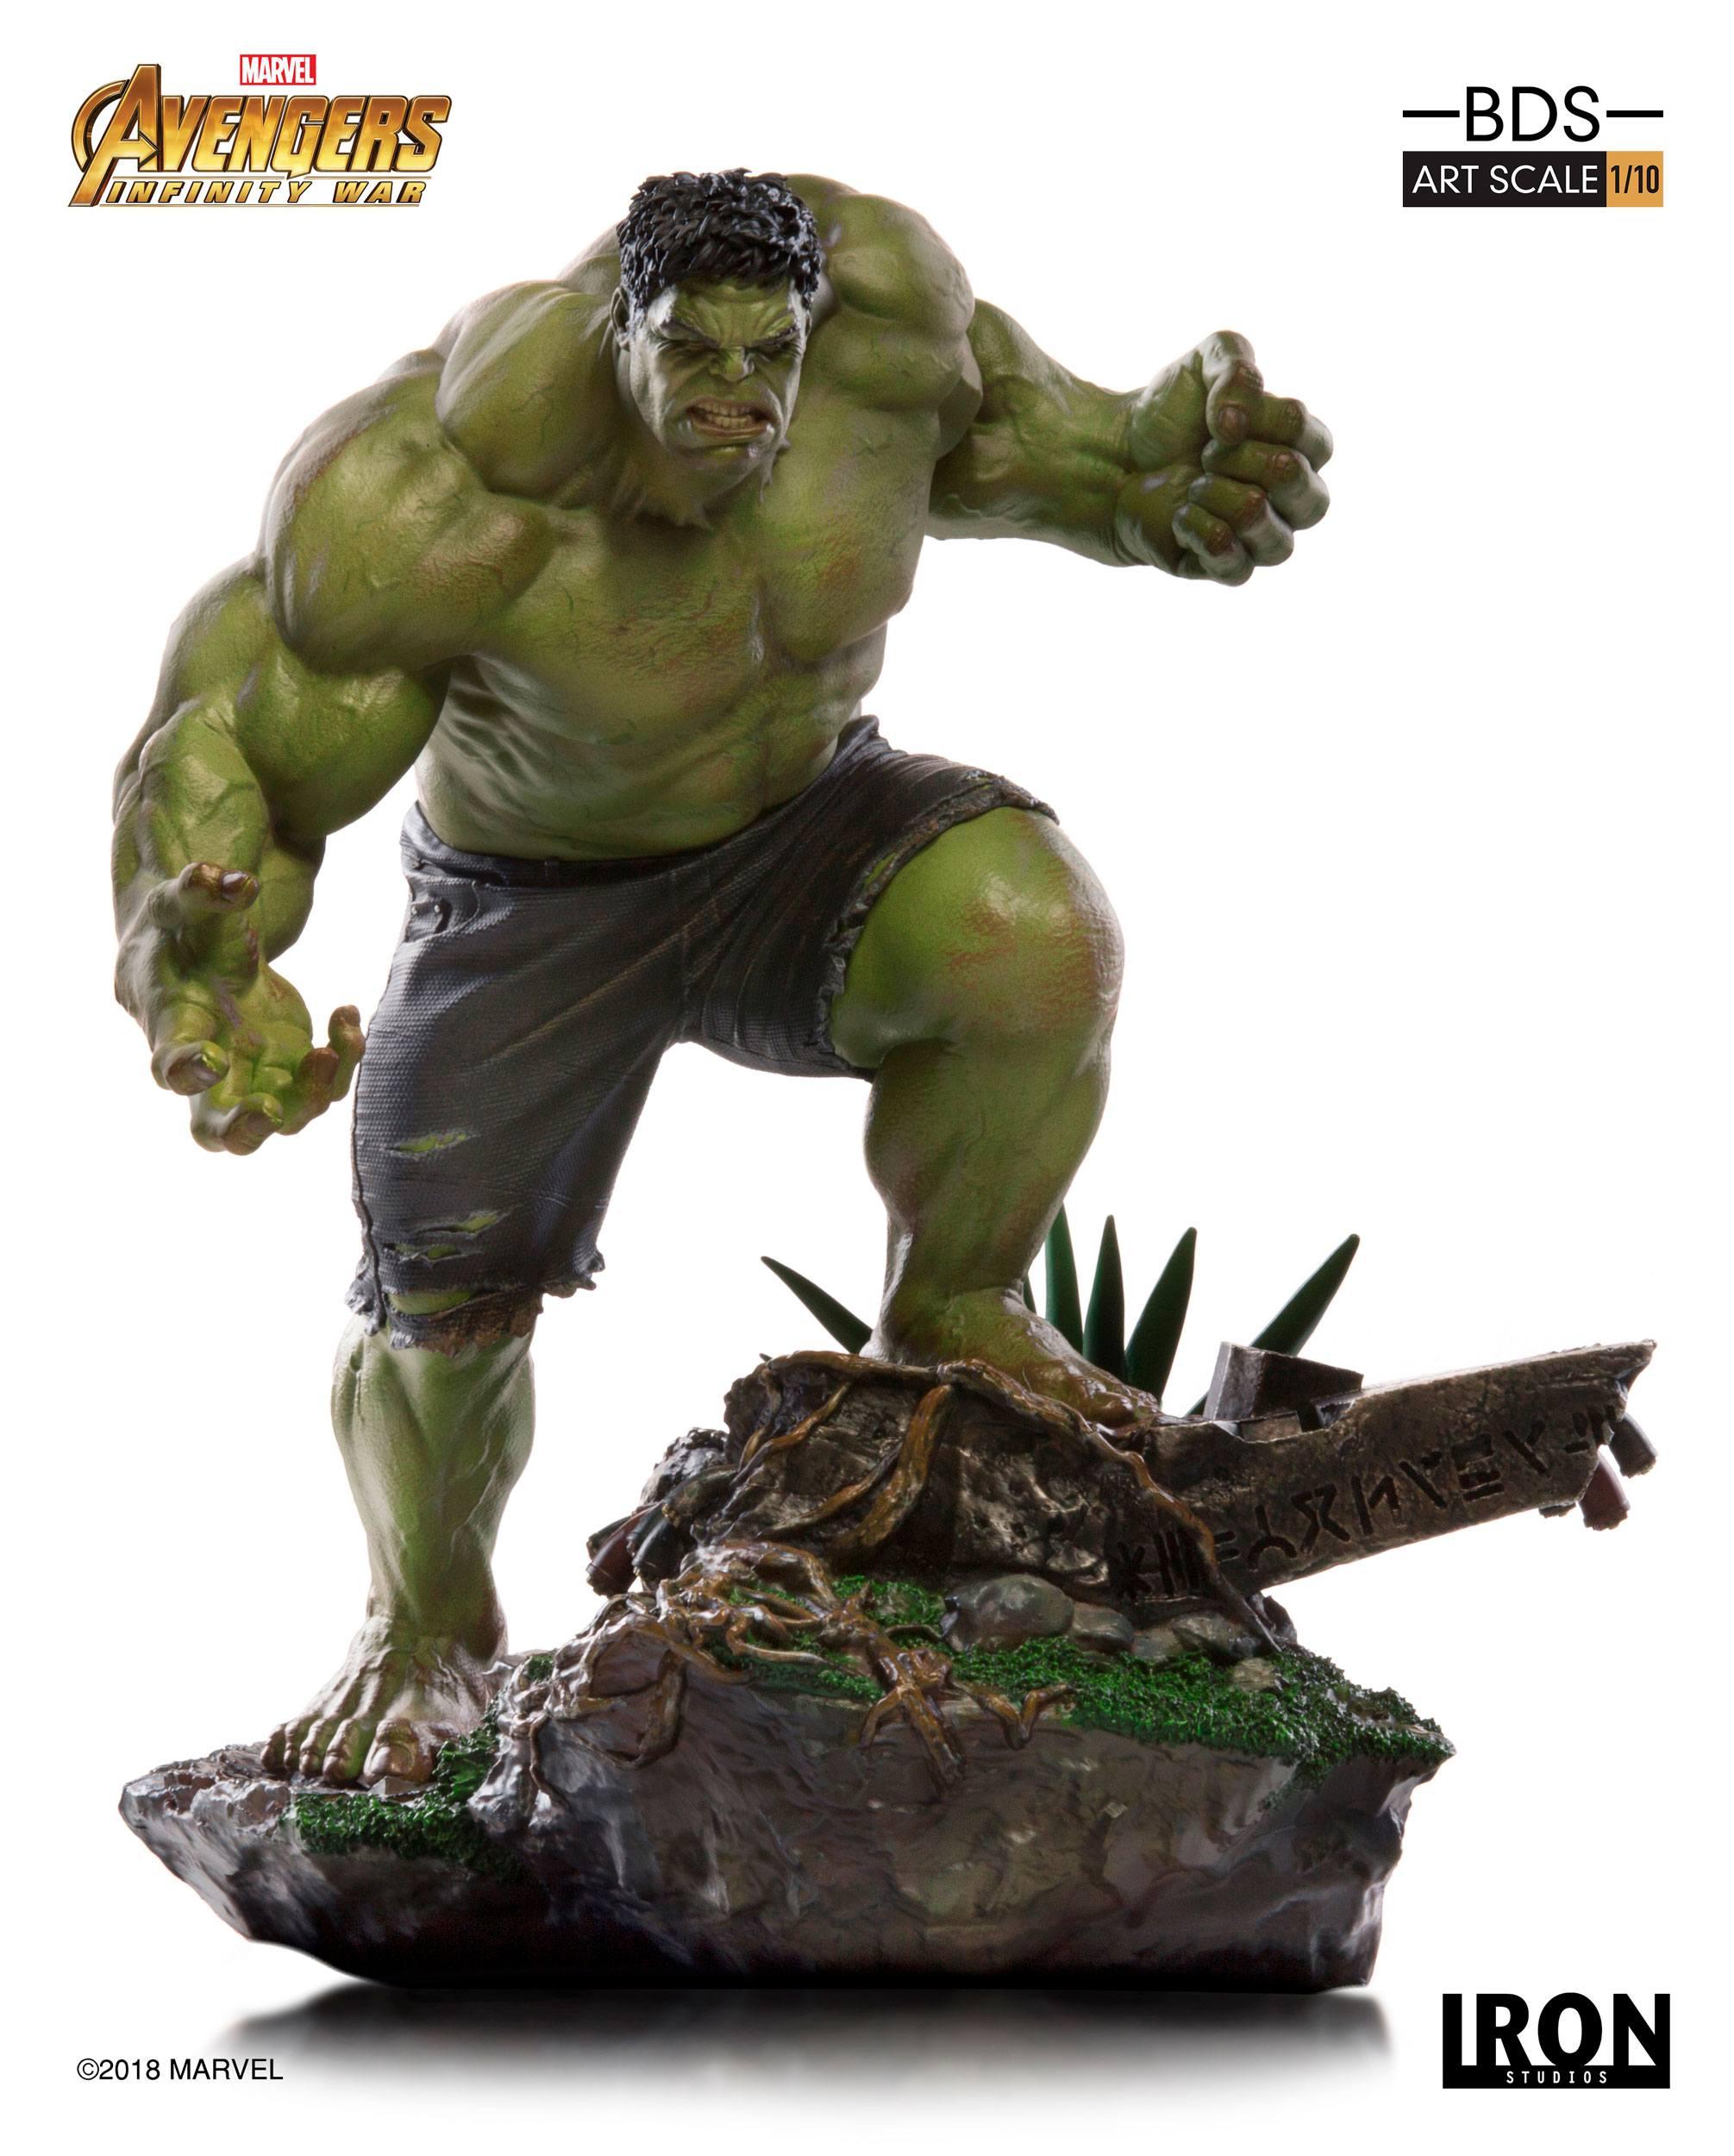 Infinity War Thor 1:10 Art Scale Statue Iron Studios Marvel Avengers 3 NEW